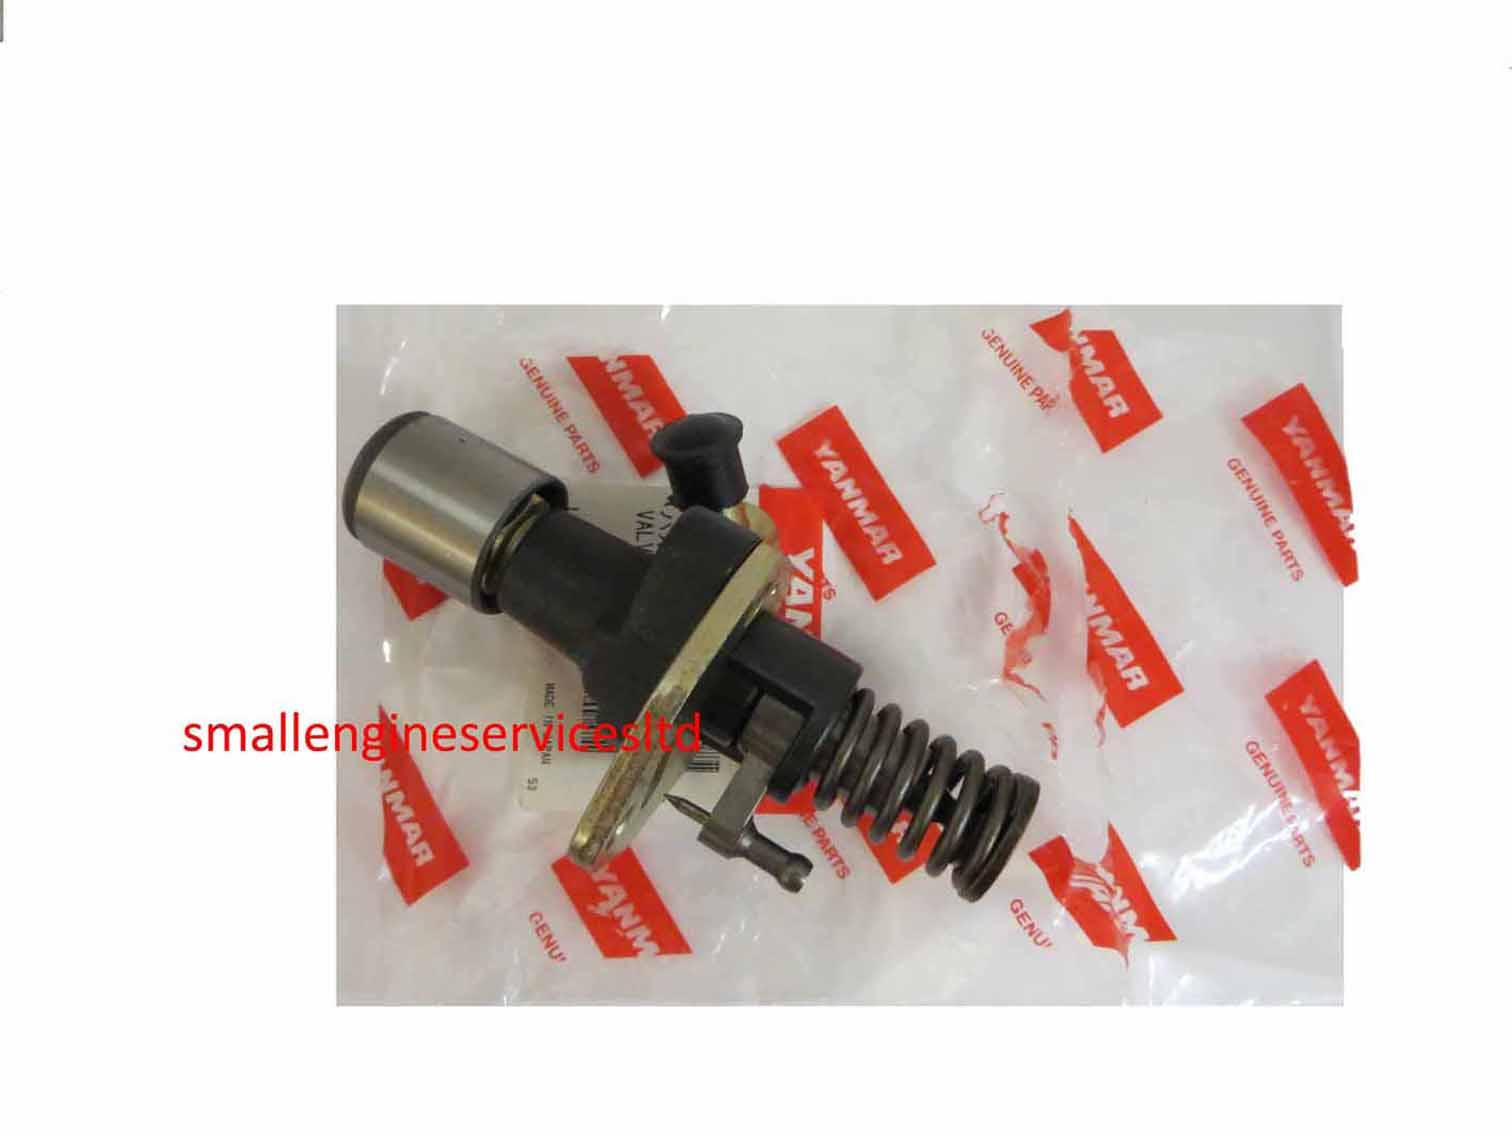 L100AE injector pump GENUINE YANMAR PART